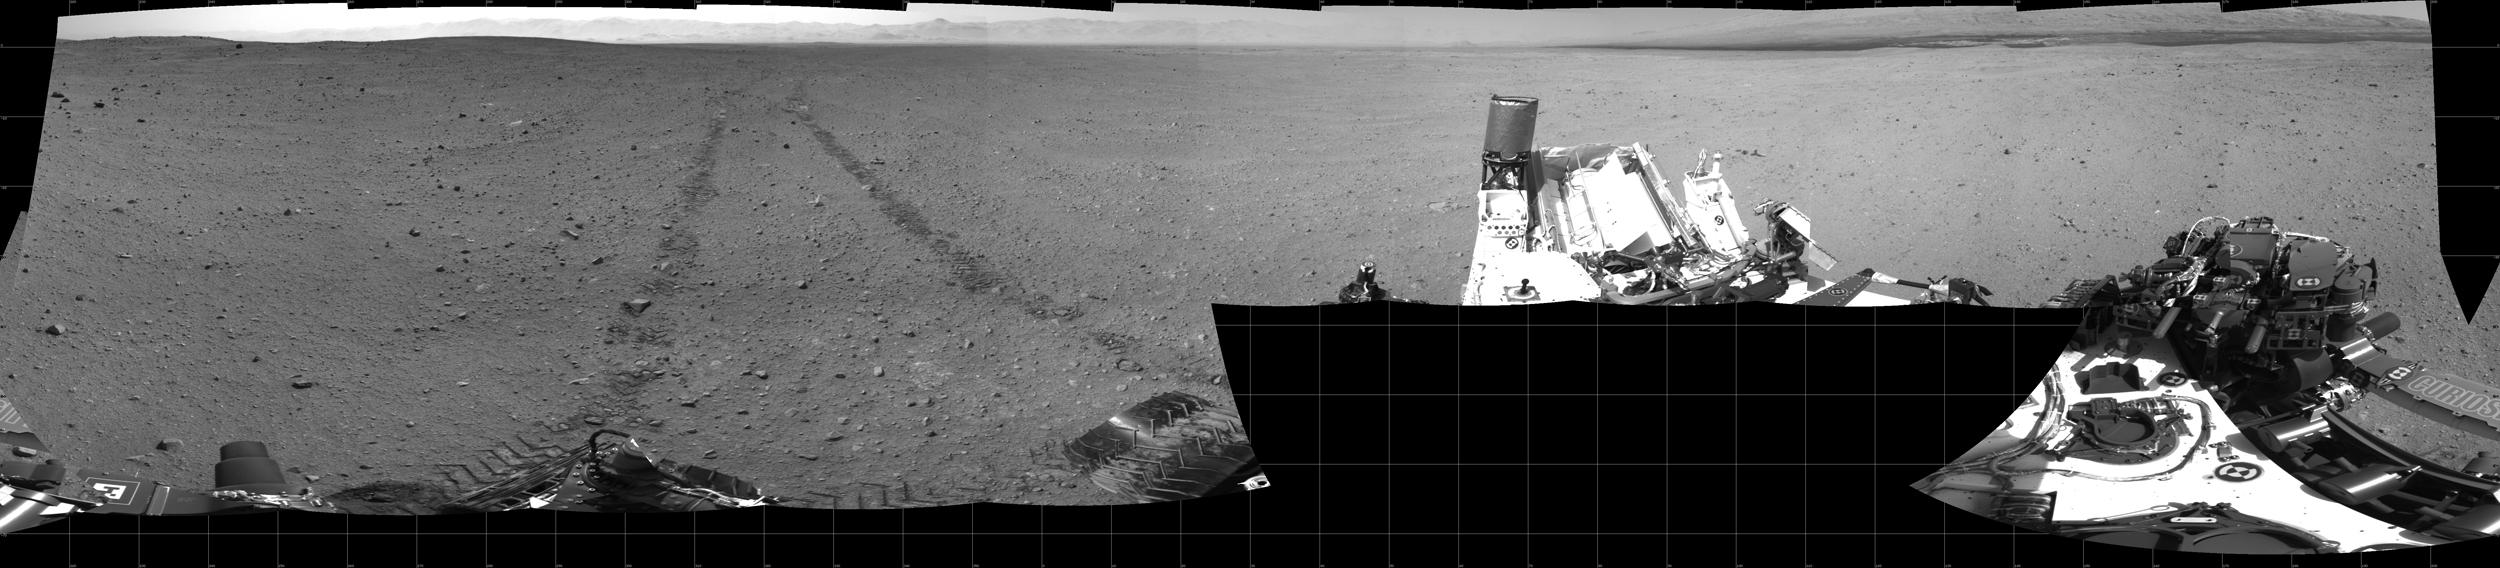 Looking Back: Mars Rover Curiosity